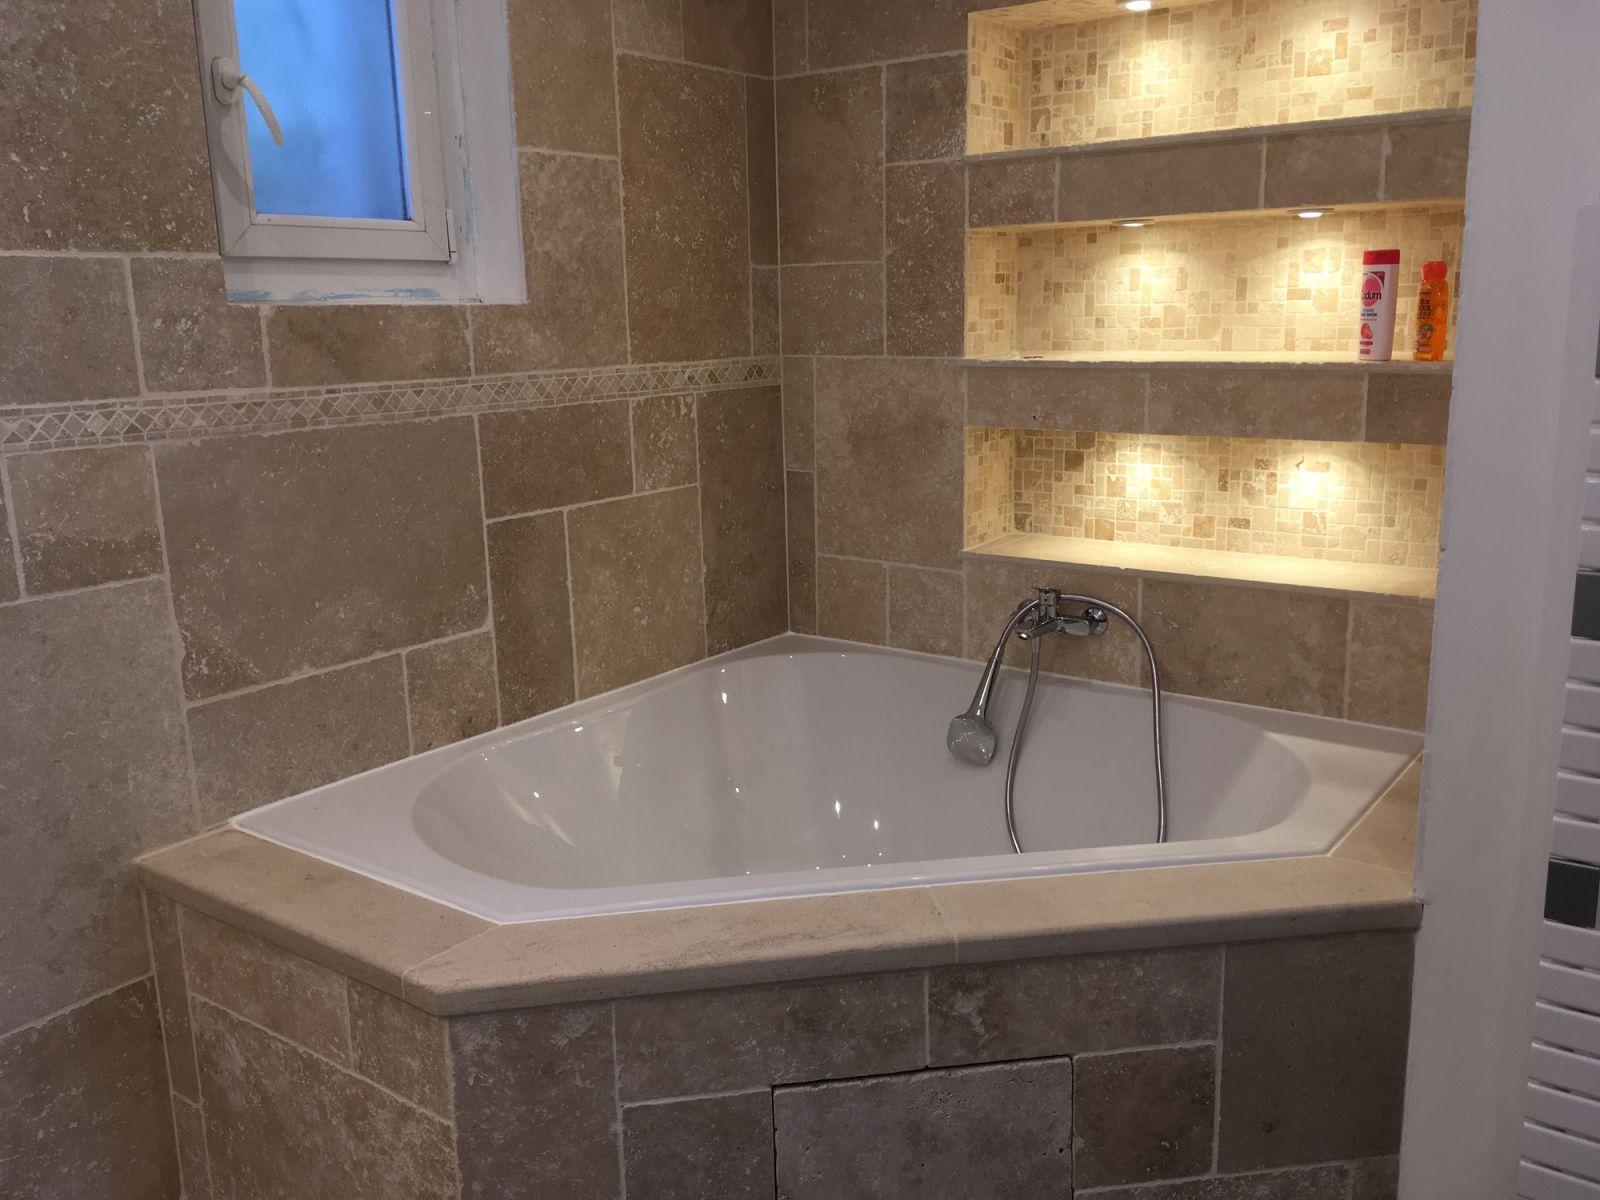 Salle De Bain Travertin Ivoire ~ salle de bains travertin salle de bains travertin with salle de